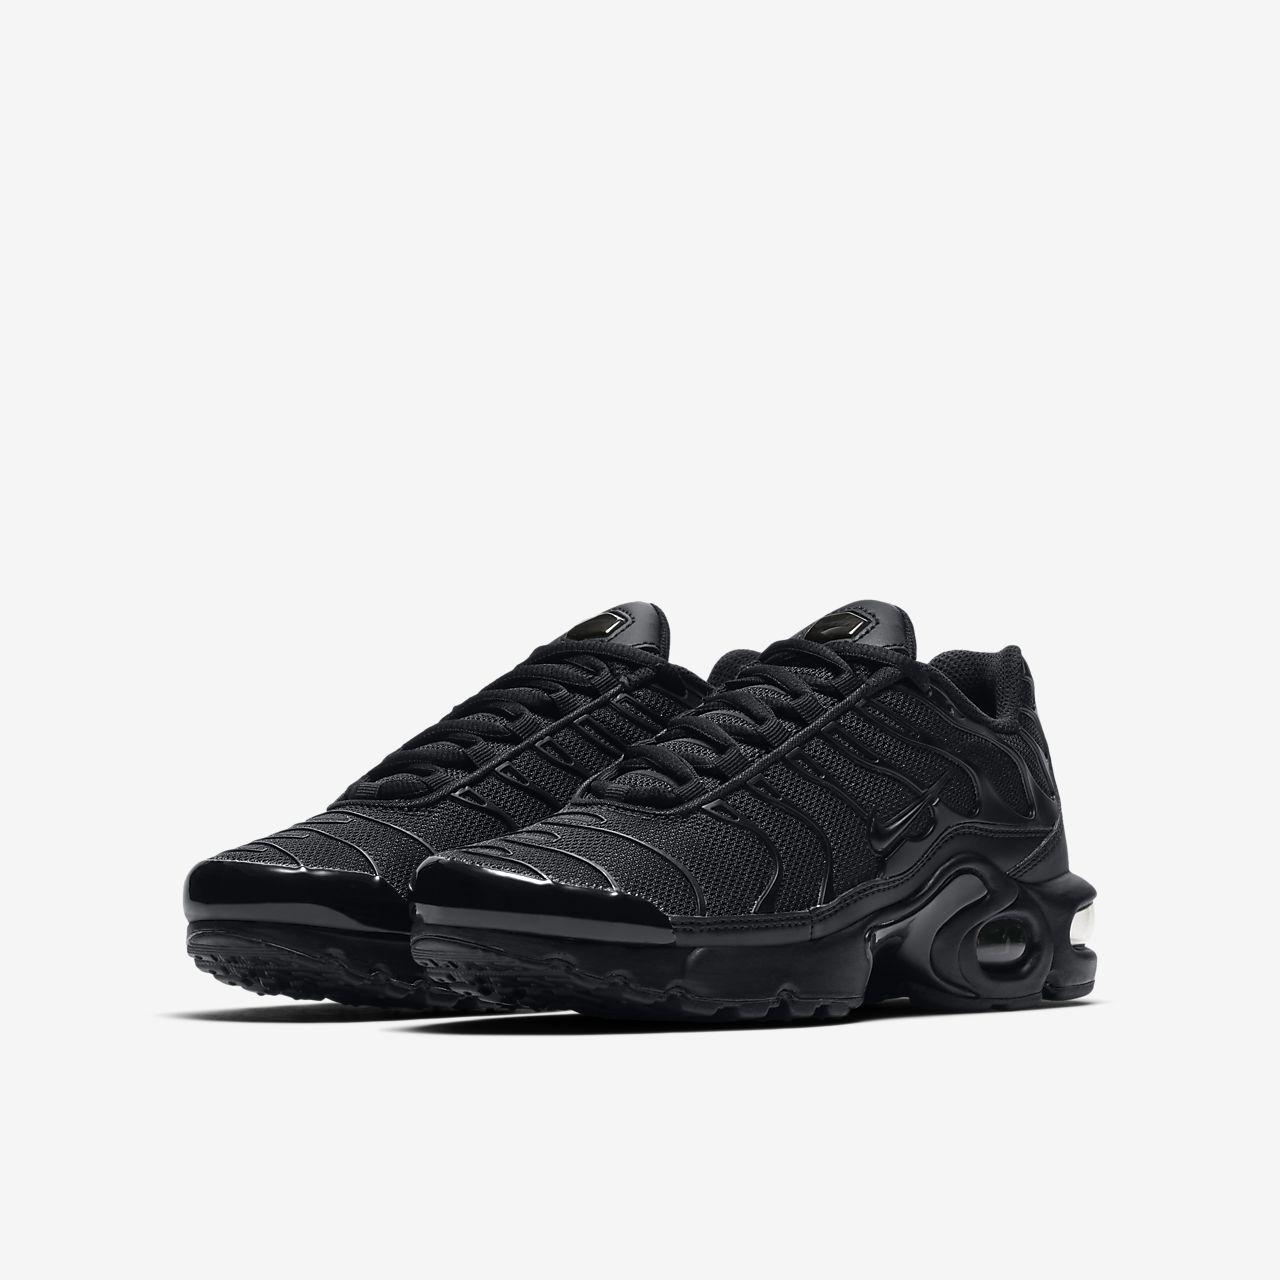 low priced 0bf7c a4547 ... Nike Air Max Plus sko til store barn